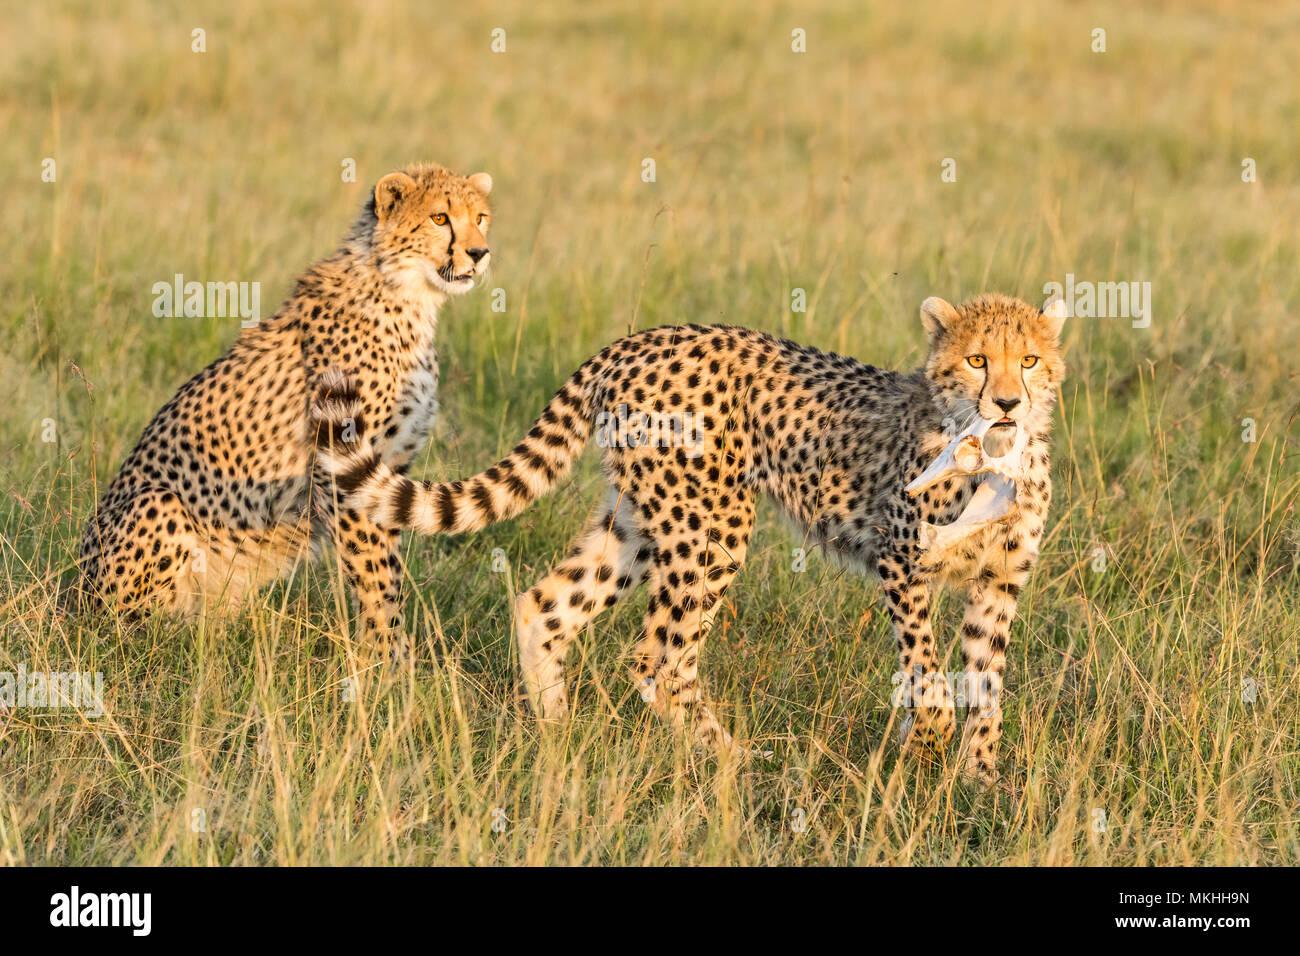 Cheetah (Acinonyx jubatus), young playing with bones, Masai-Mara National Reserve, Kenya - Stock Image